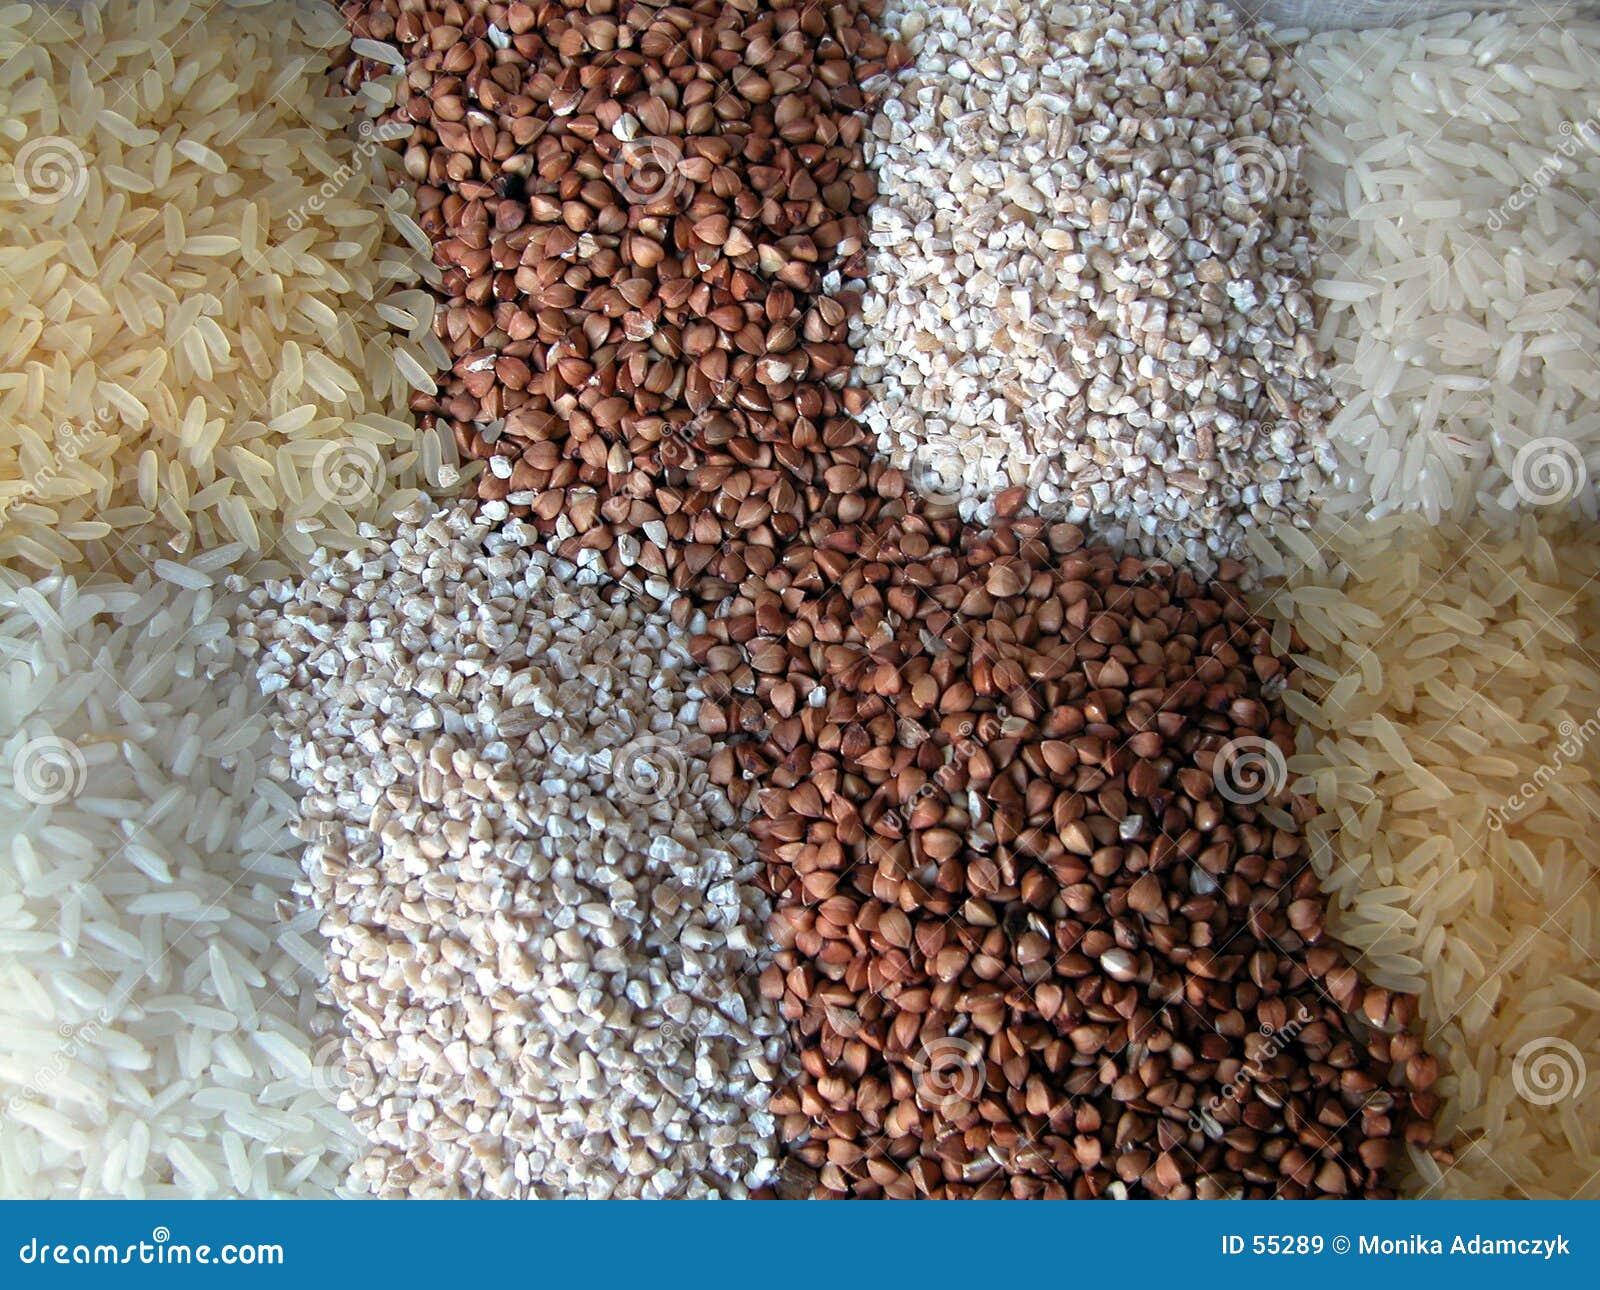 Download ρύζι στοκ εικόνα. εικόνα από δημητριακά, τρόφιμα, διαβίωση - 55289